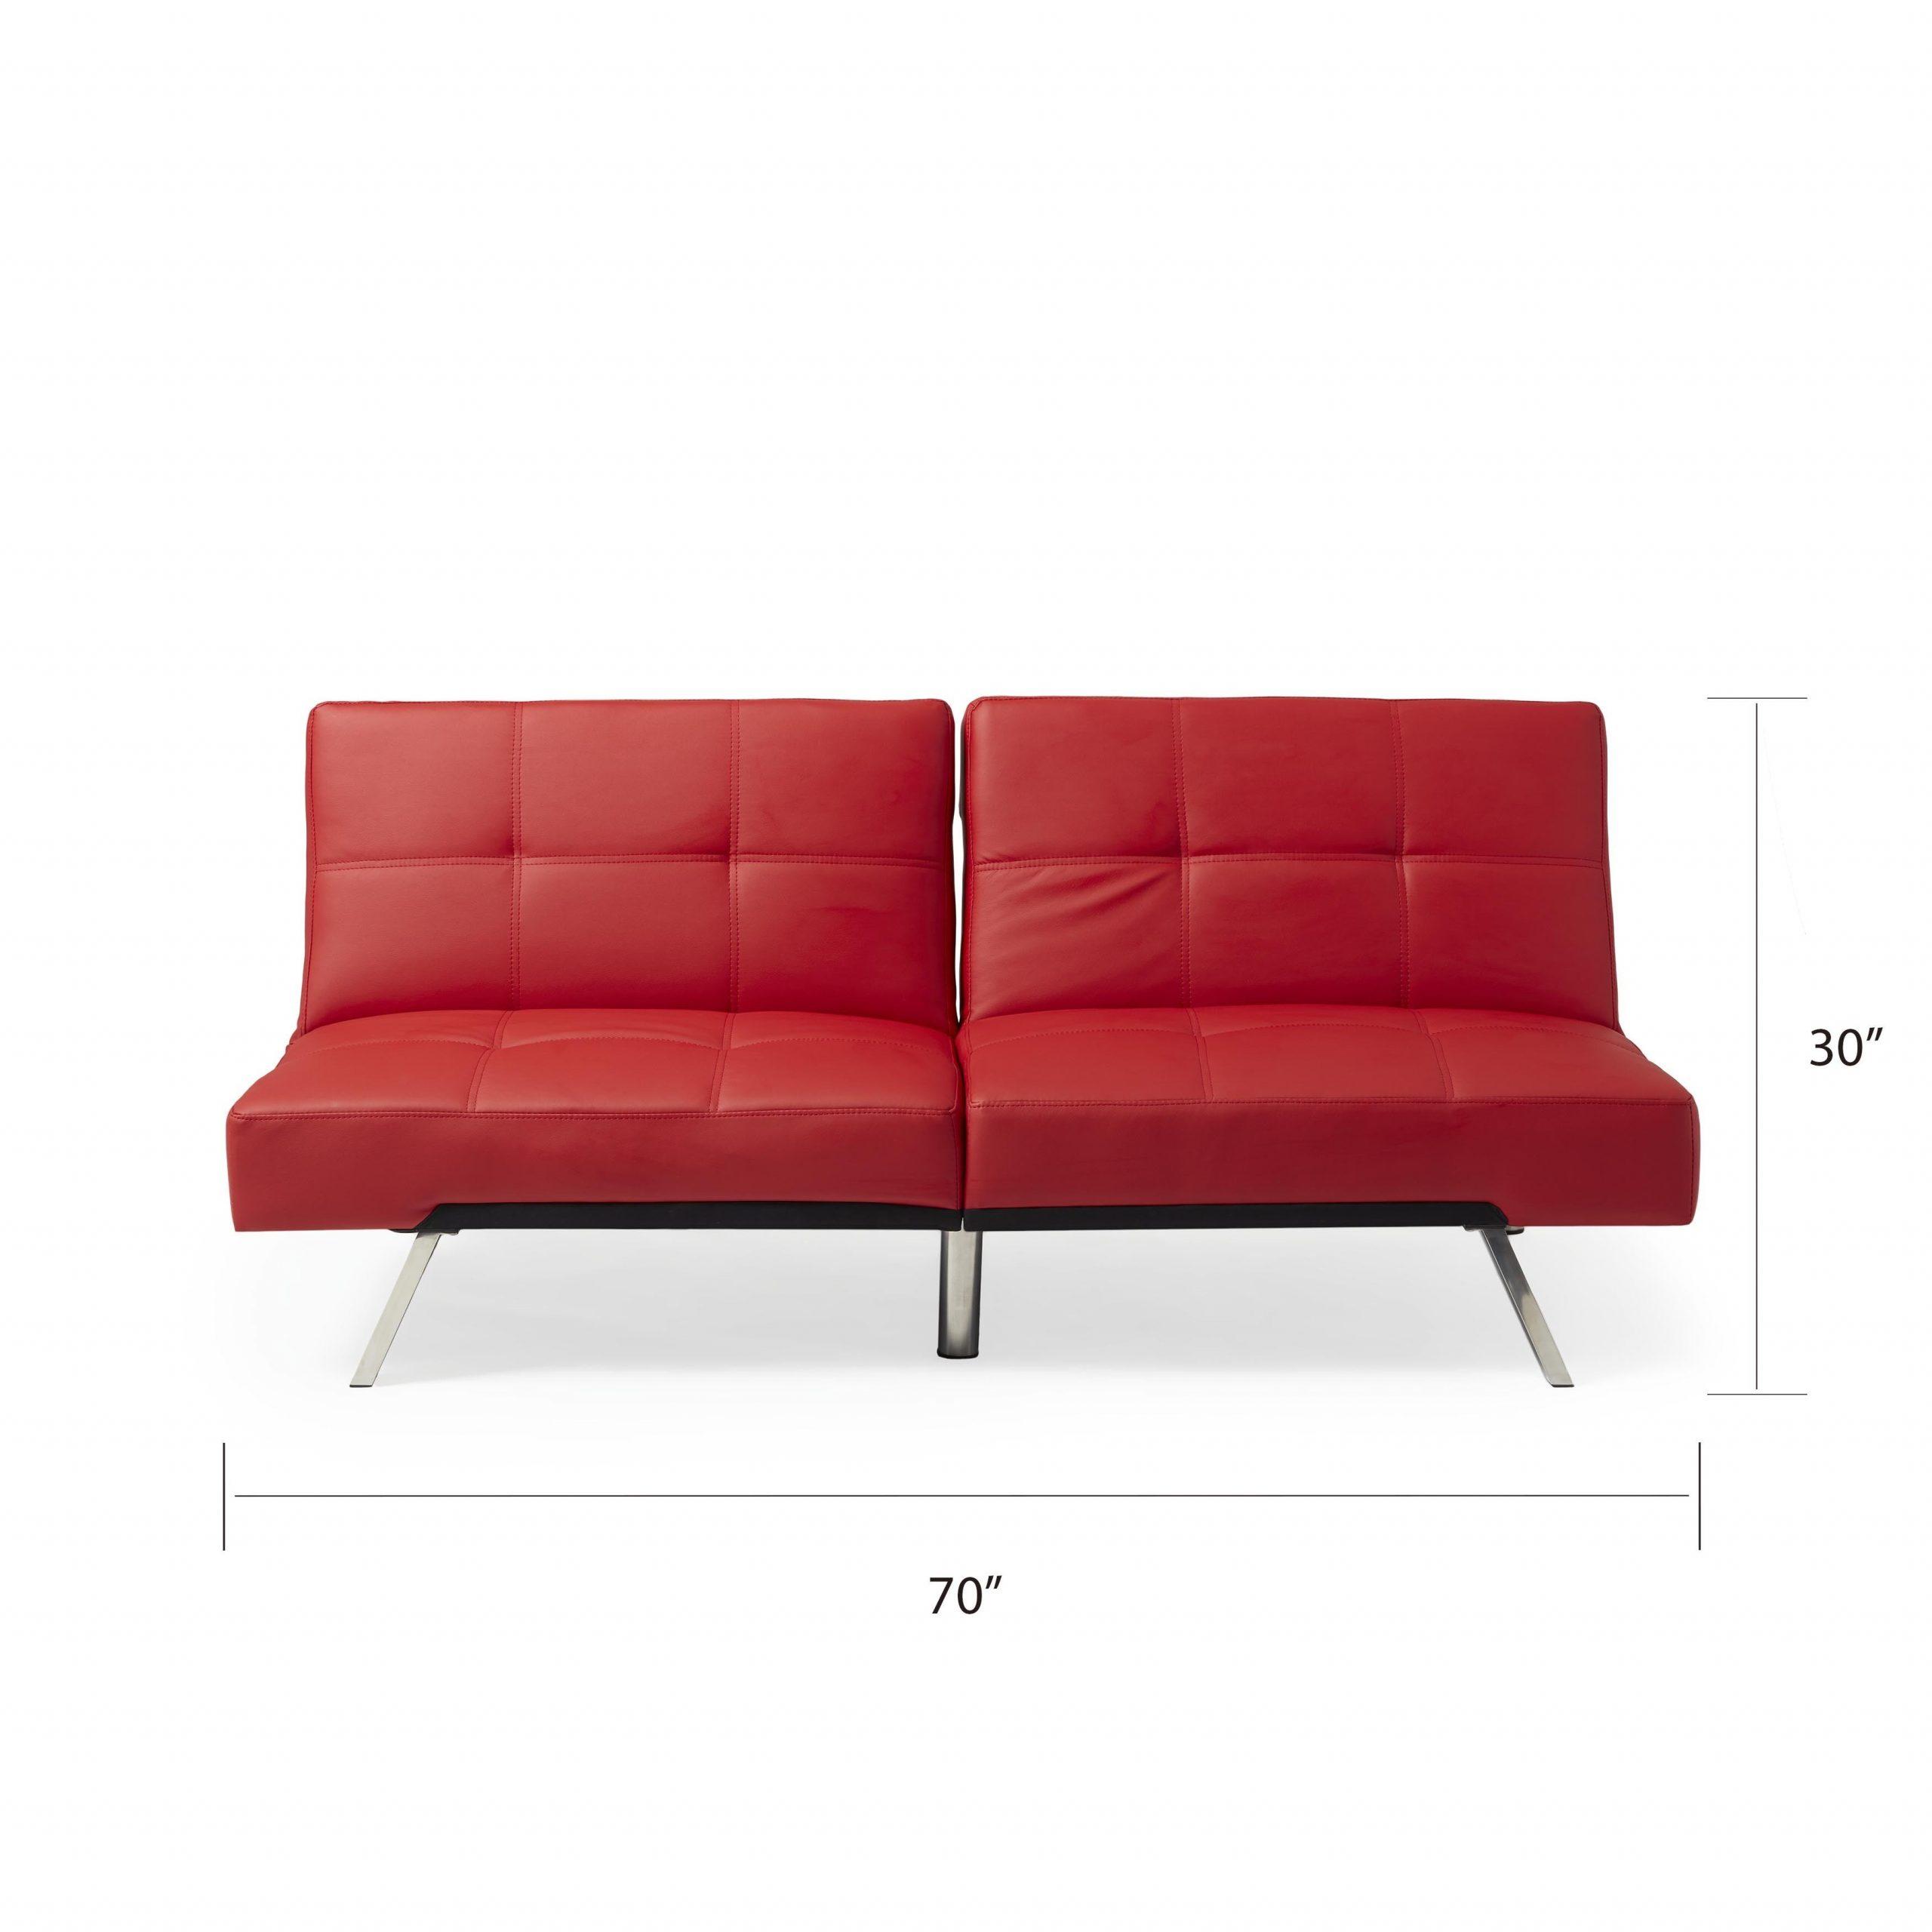 Abbyson Aspen Red Bonded Leather Foldable Futon Sleeper With Regard To Aspen Leather Sofas (View 1 of 15)